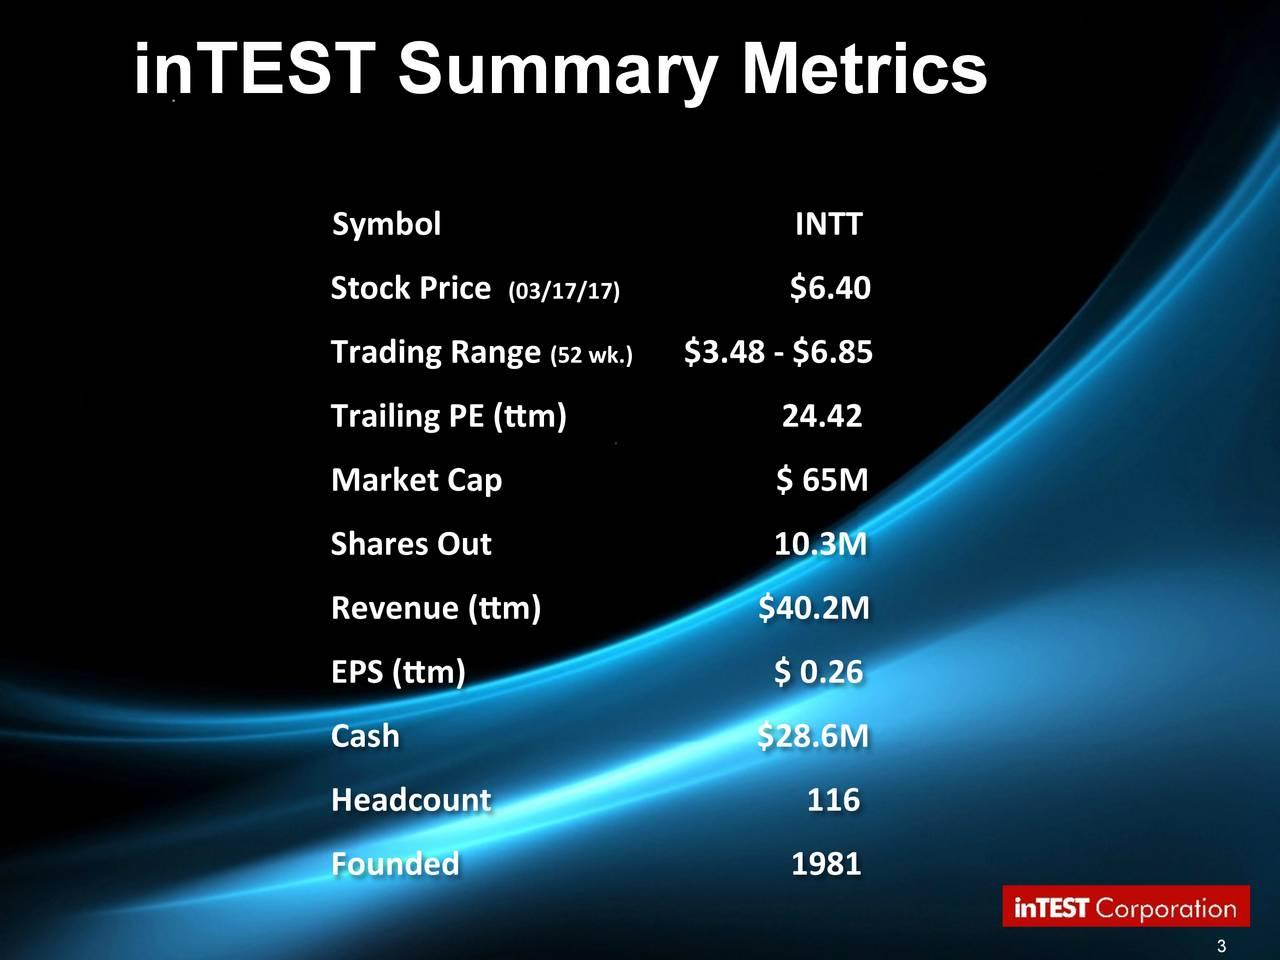 Symbol INTT Stock Price (03/17/17 $6.40 Trading Range (52 wk.) $3.48 - $6.85 Trailing PE (m) 24.42 Market Cap $ 65M Shares Out 10.3M Revenue (m) $40.2M EPS (m) $ 0.26 Cash $28.6M Headcount 116 Founded 1981